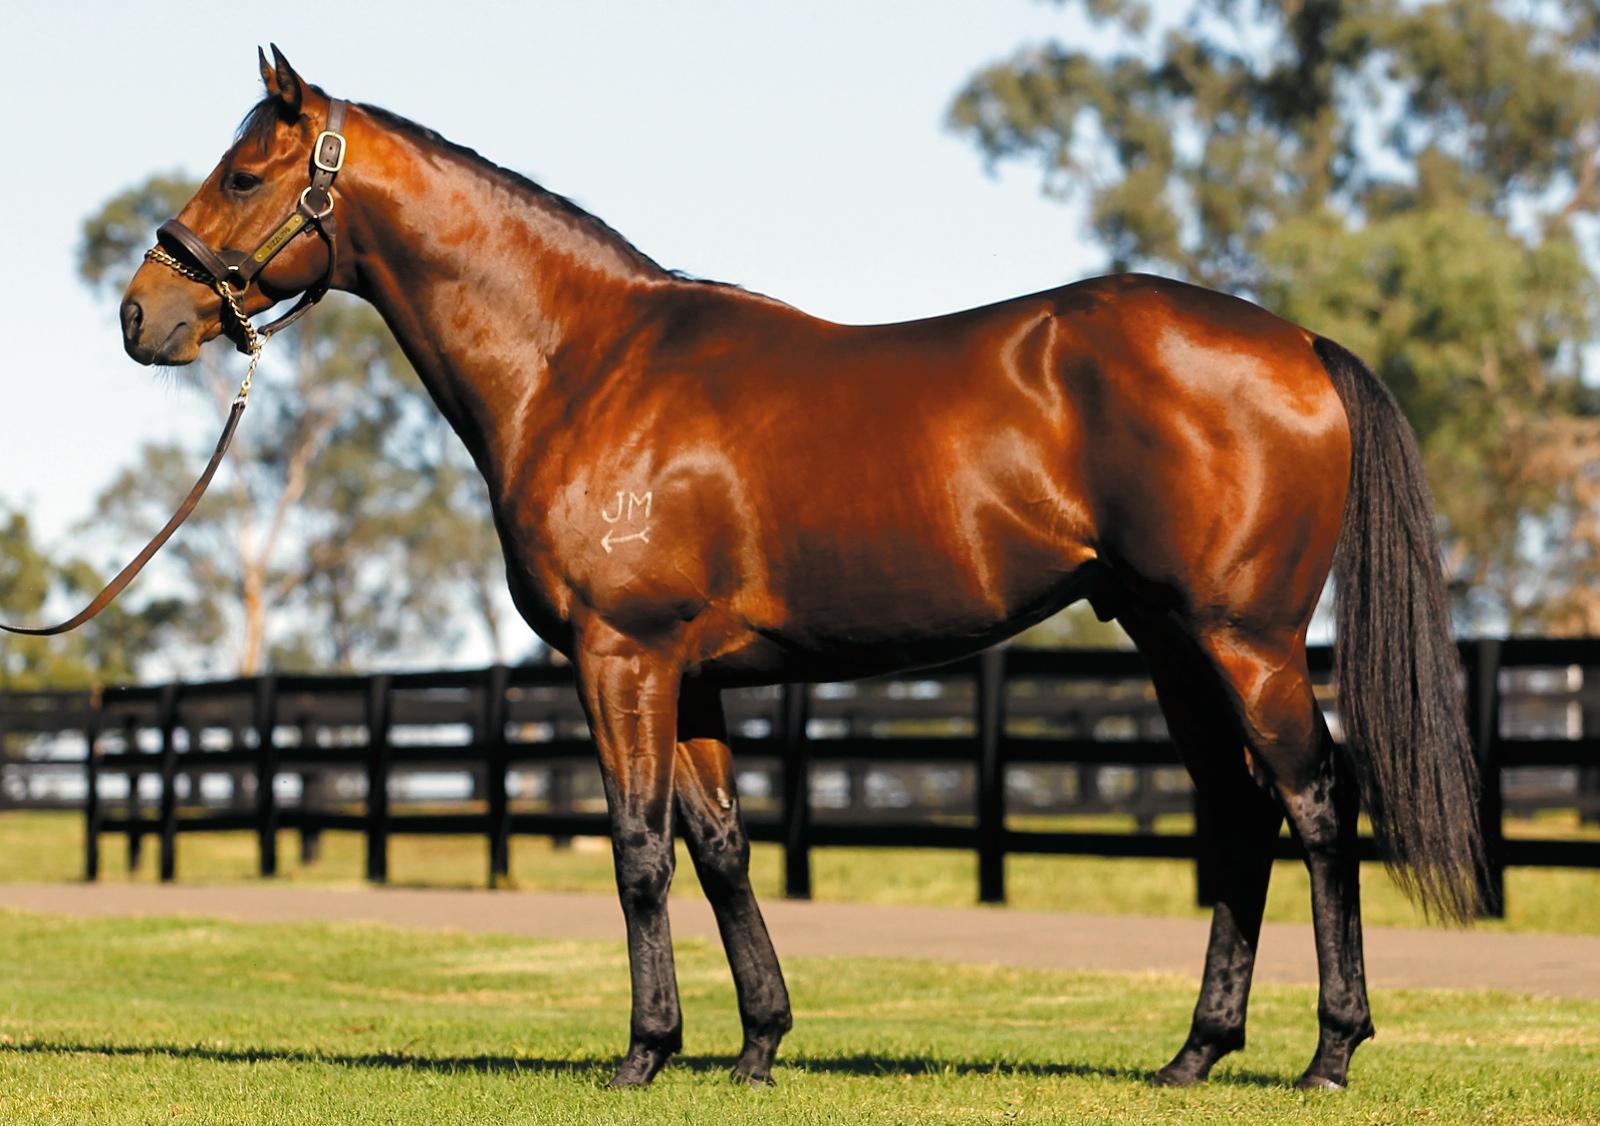 https://www.stallions.com.au/wp-content/uploads/2019/09/103841418.jpg